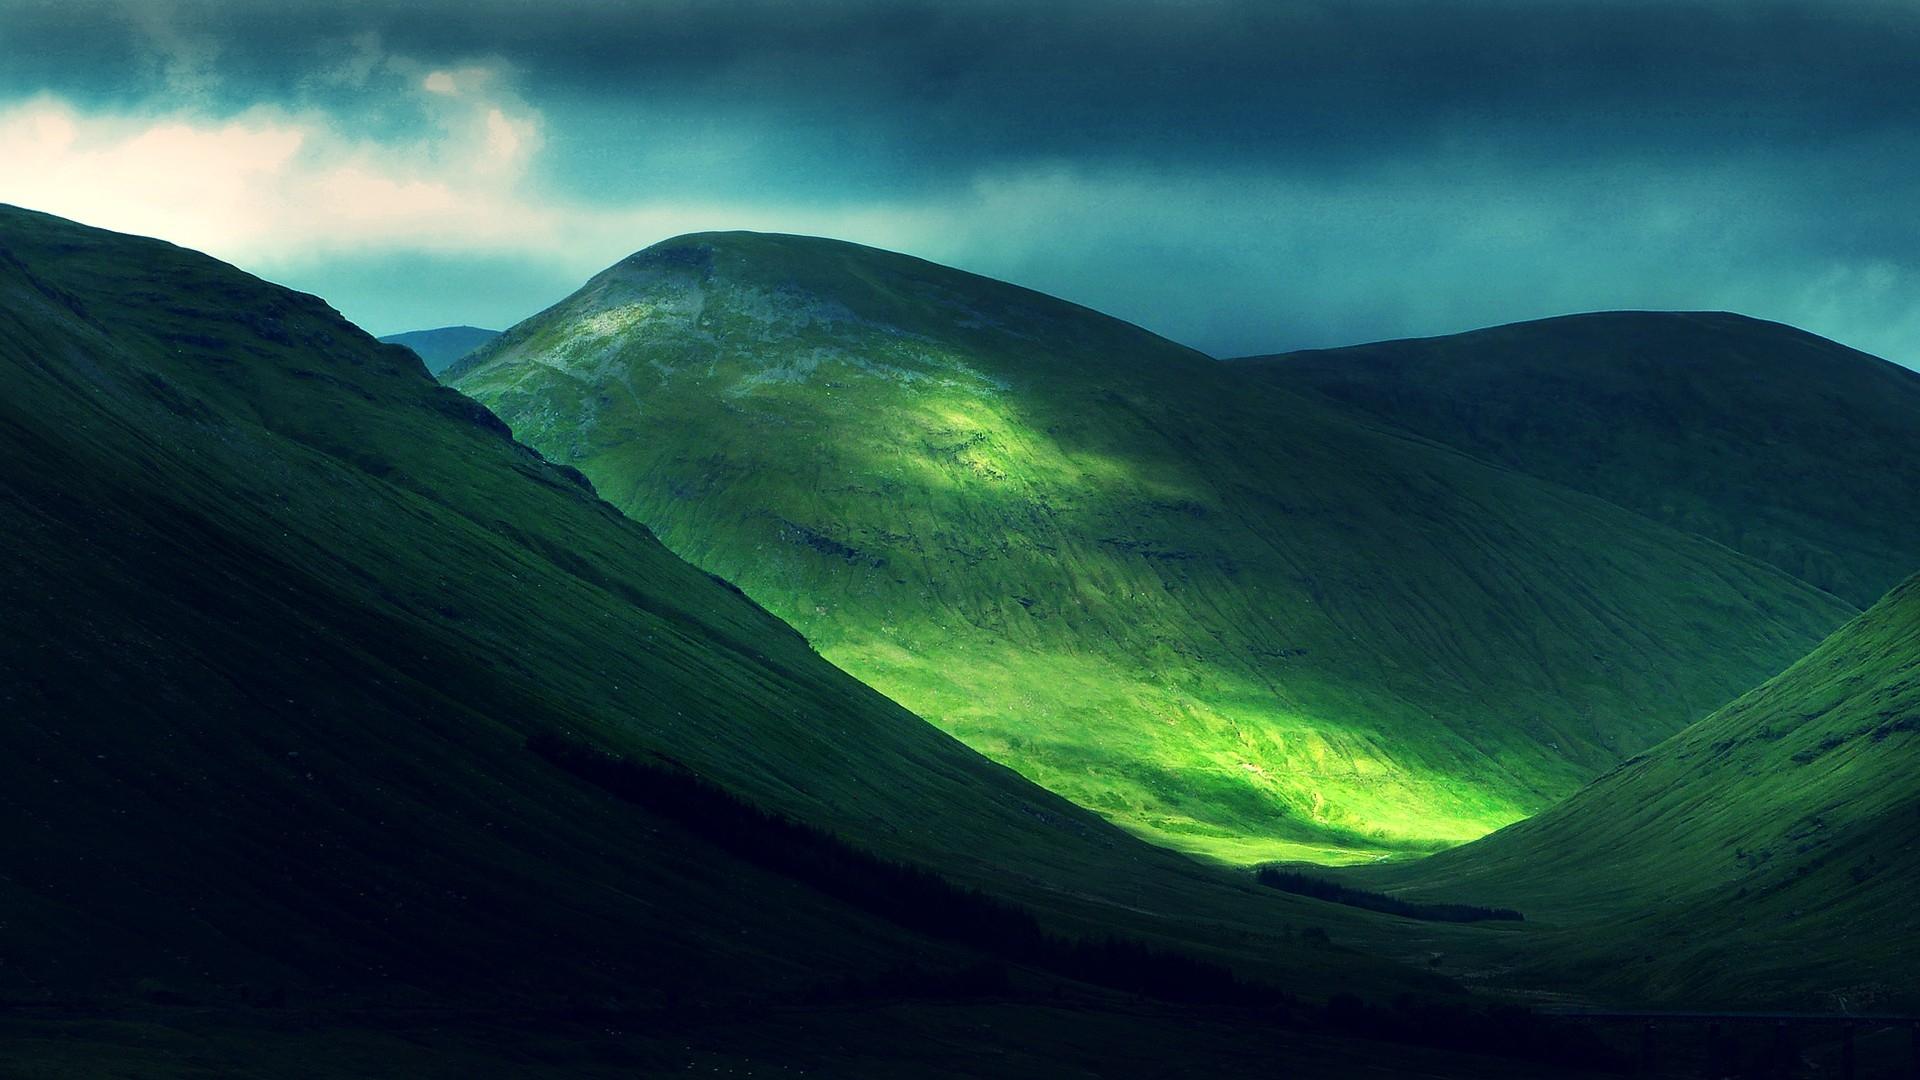 landscape of green hills HD Desktop Wallpaper HD Desktop Wallpaper 1920x1080